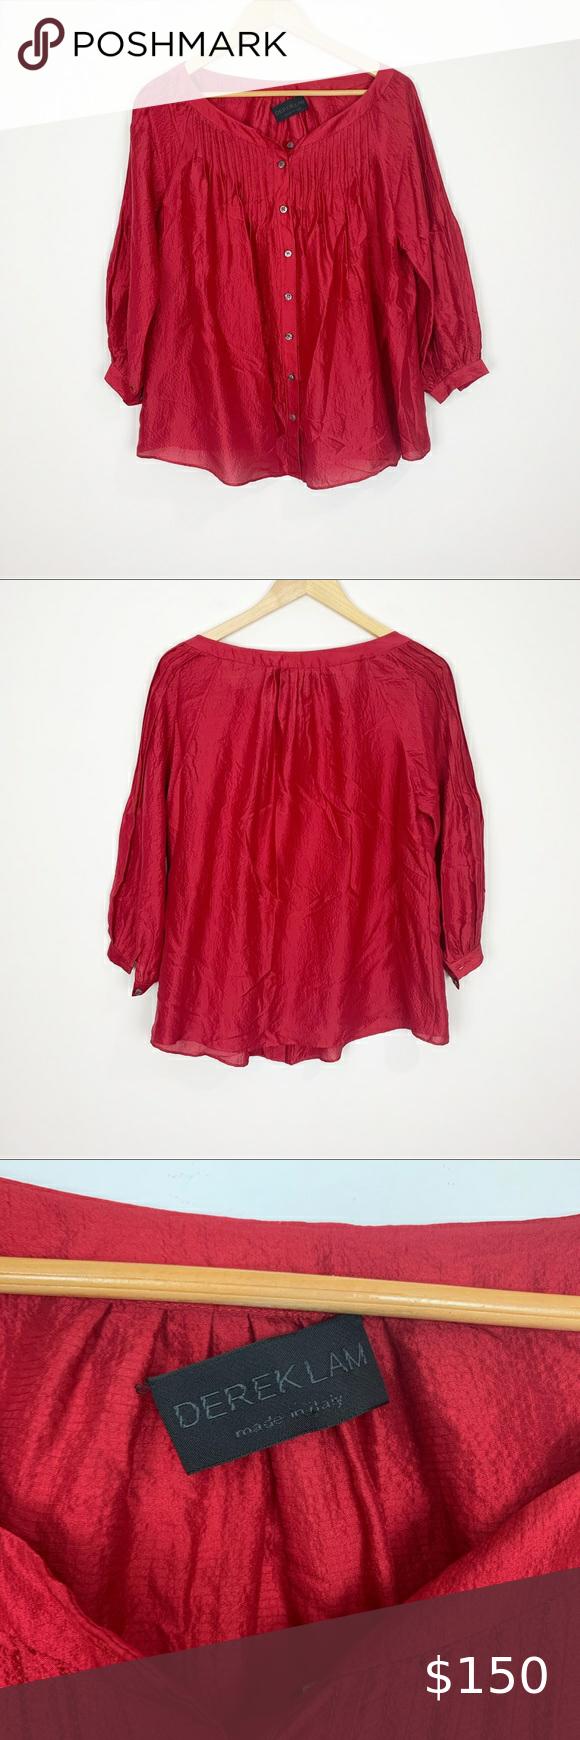 Derek Lam pale pink fringed silk top